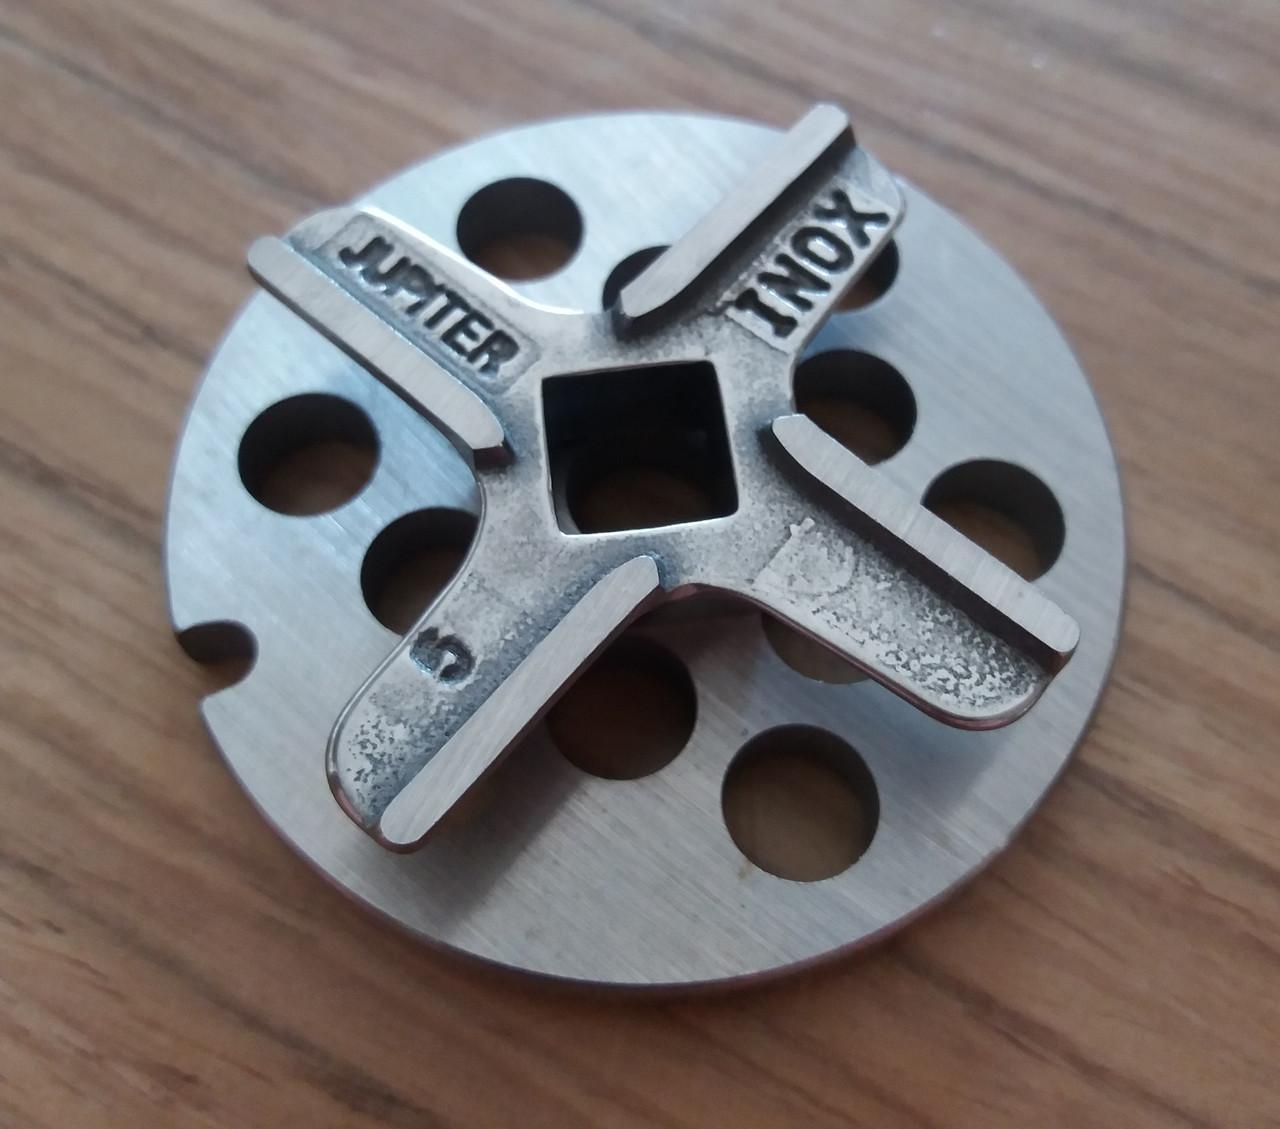 Комплект нож и решетка (крупная)  для мясорубки Bosch Champion